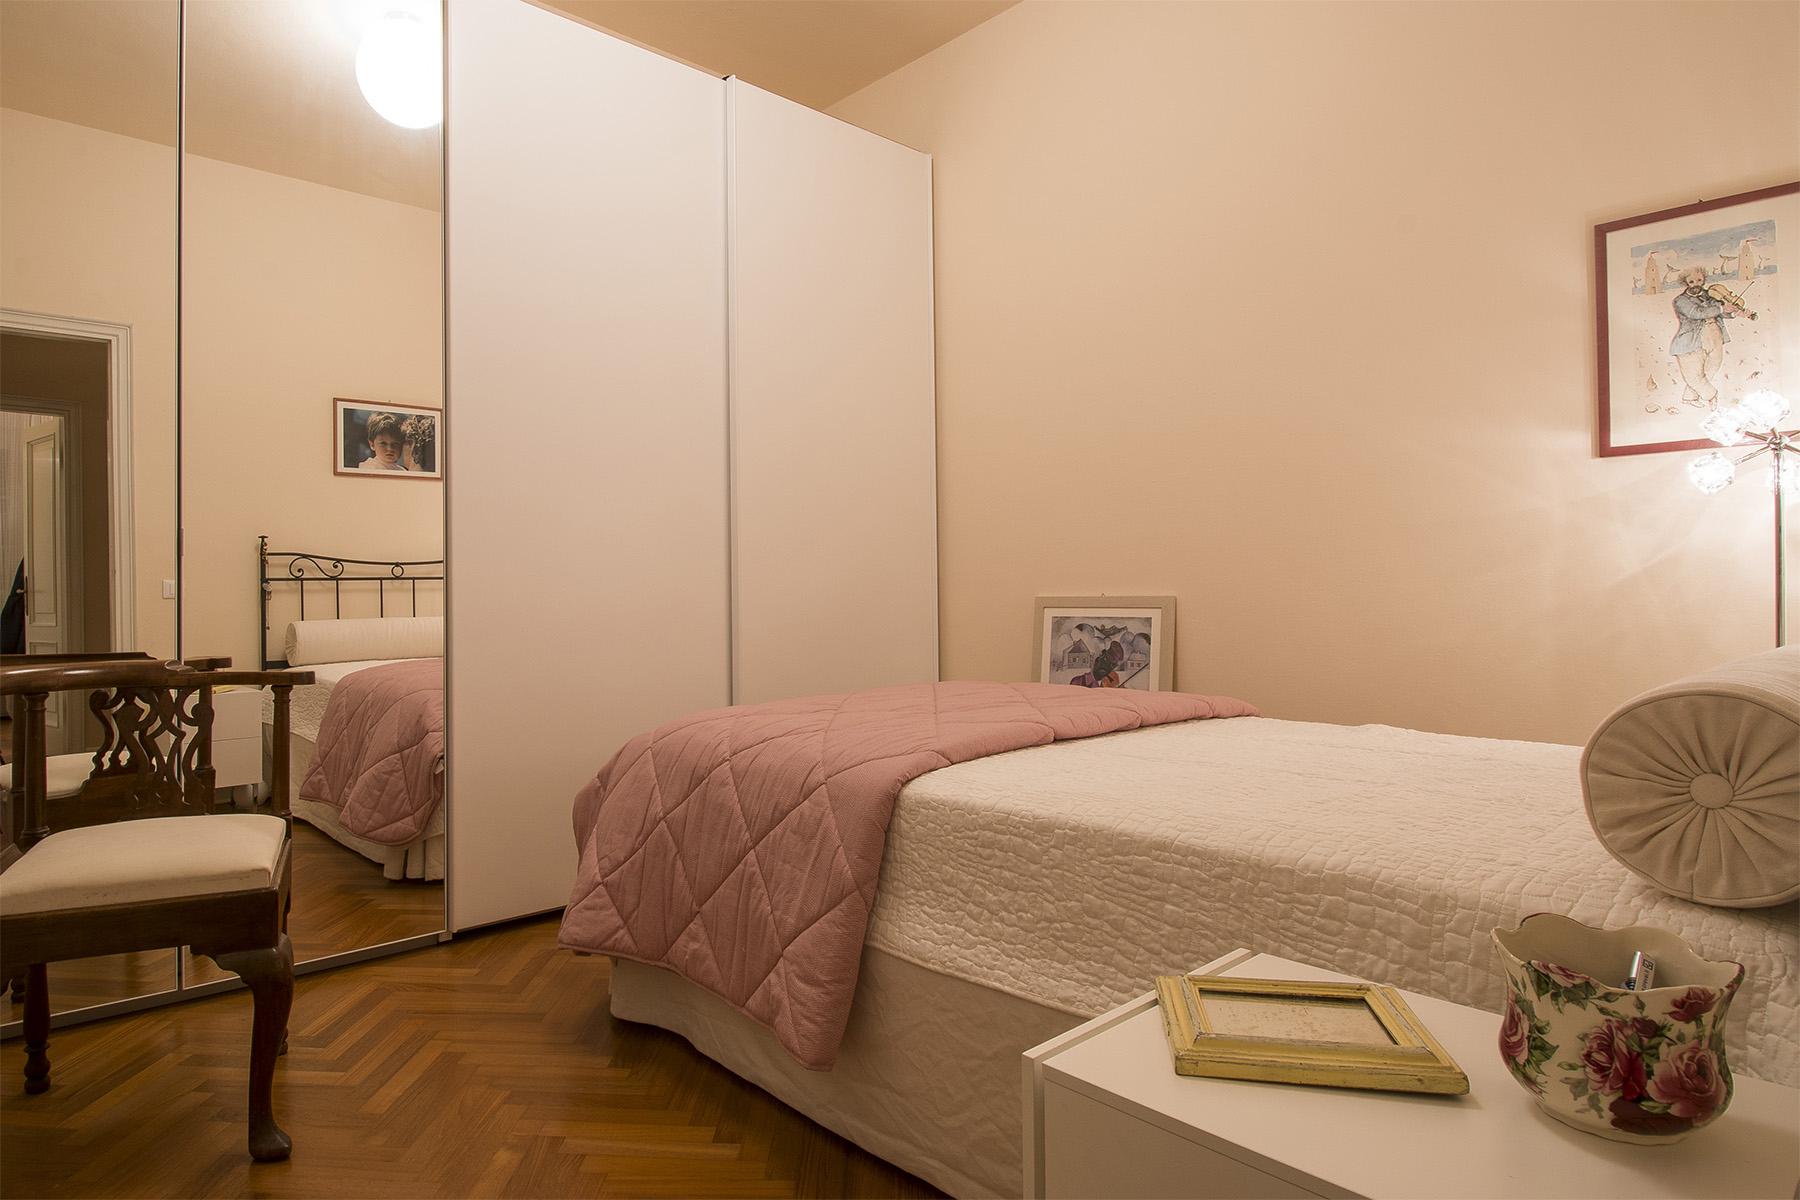 Villa in Vendita a Lucca: 5 locali, 470 mq - Foto 13